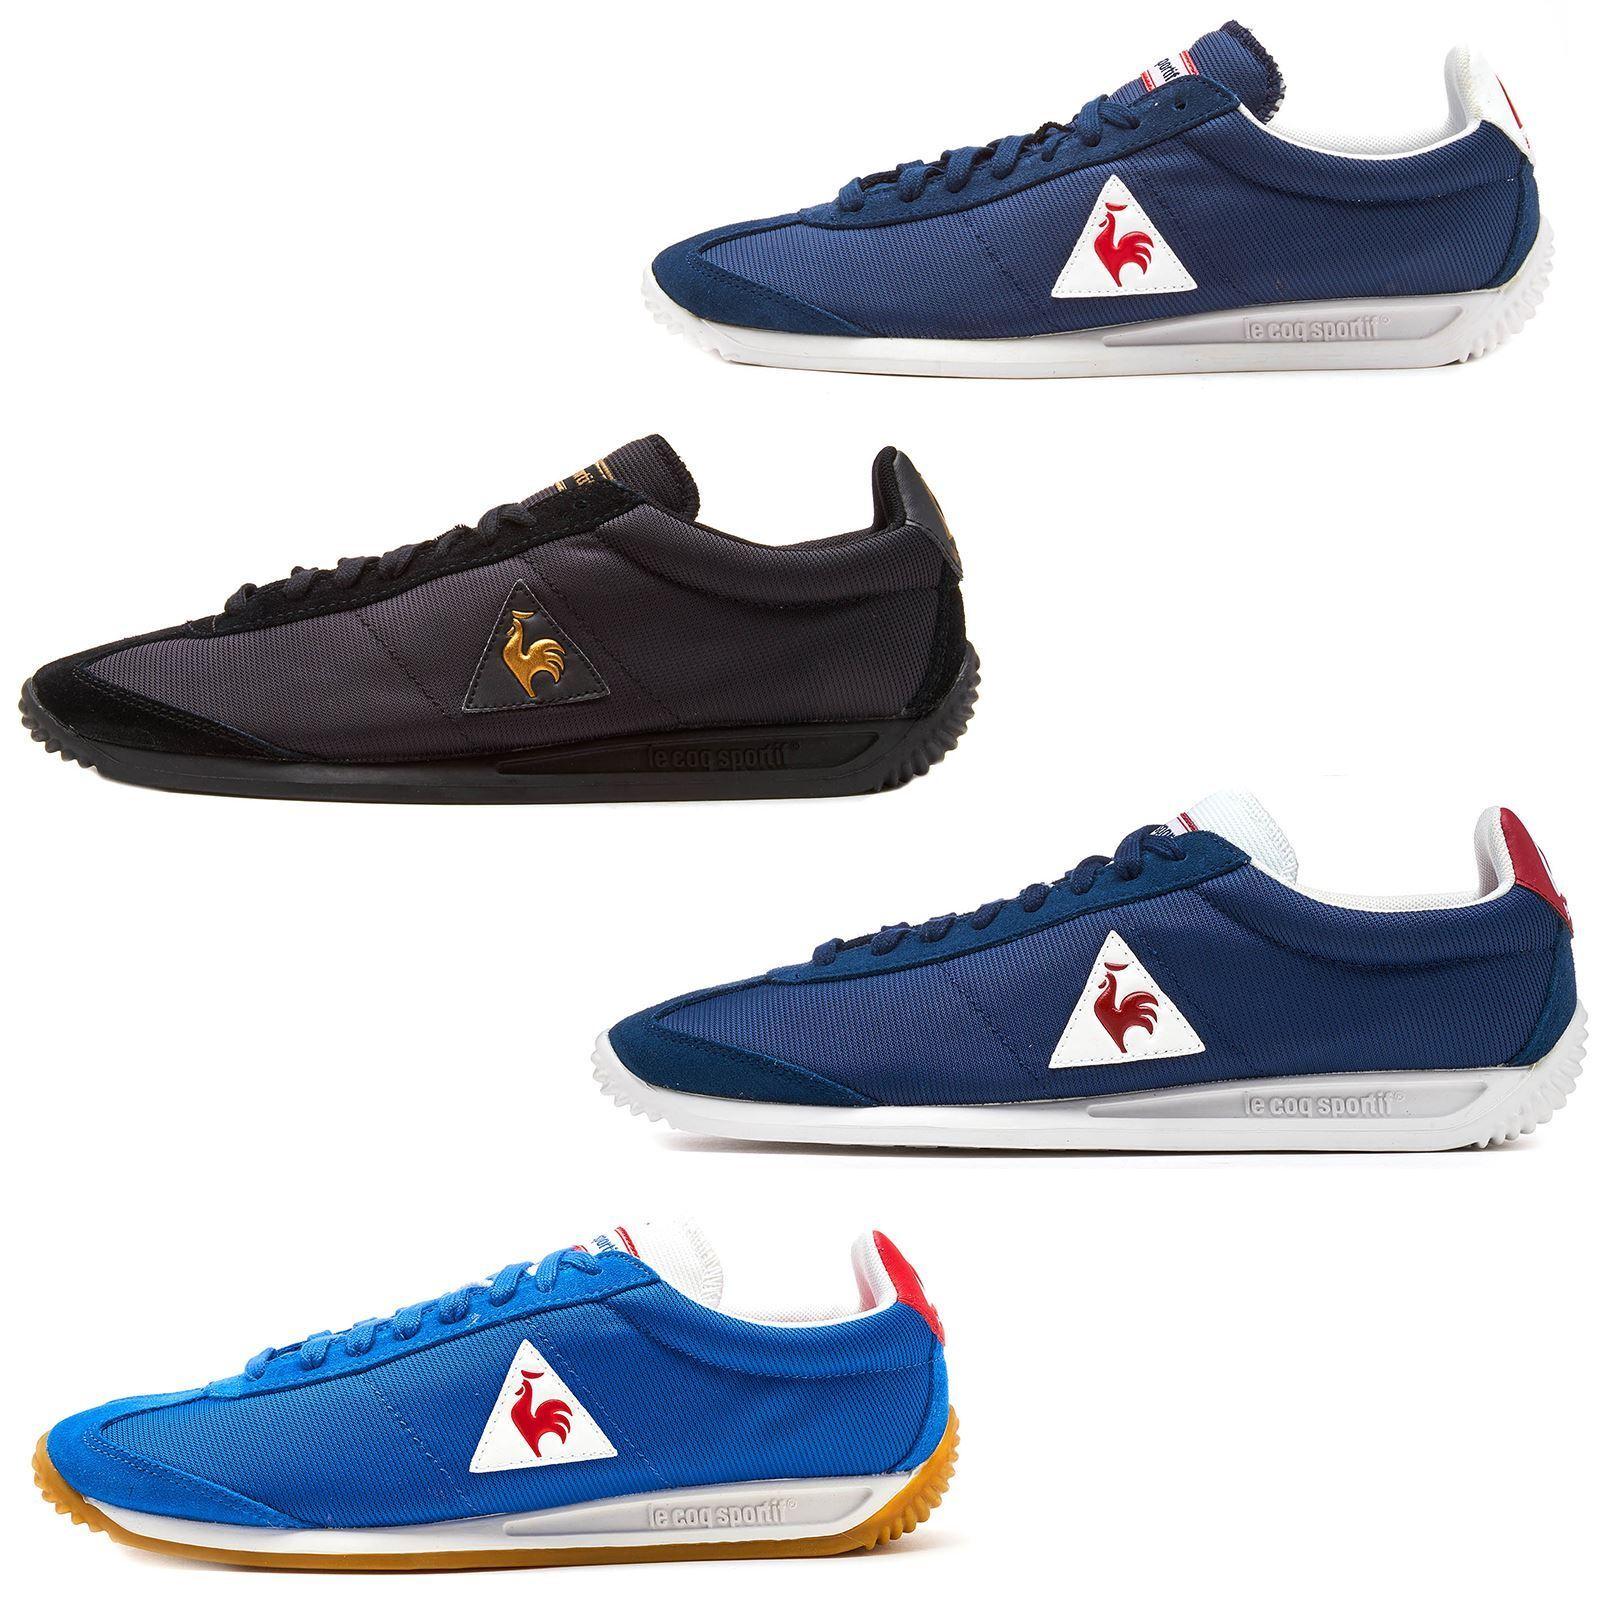 Le Coq Sportif Quartz Nylon Gum Trainers in Classic & Dress Blau & Vintage rot